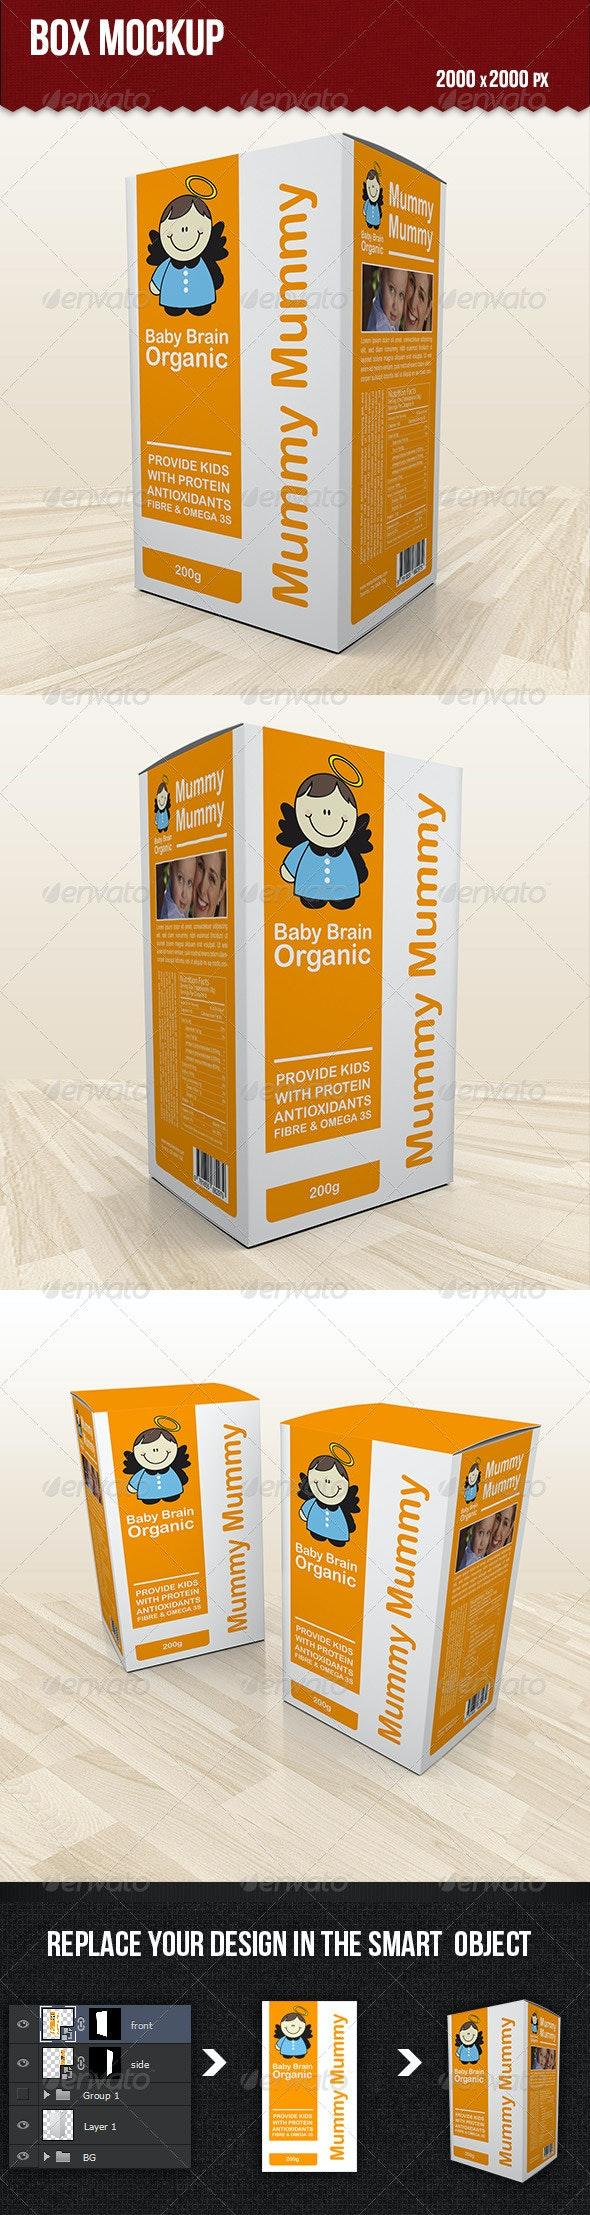 Box Mockup - Product Mock-Ups Graphics